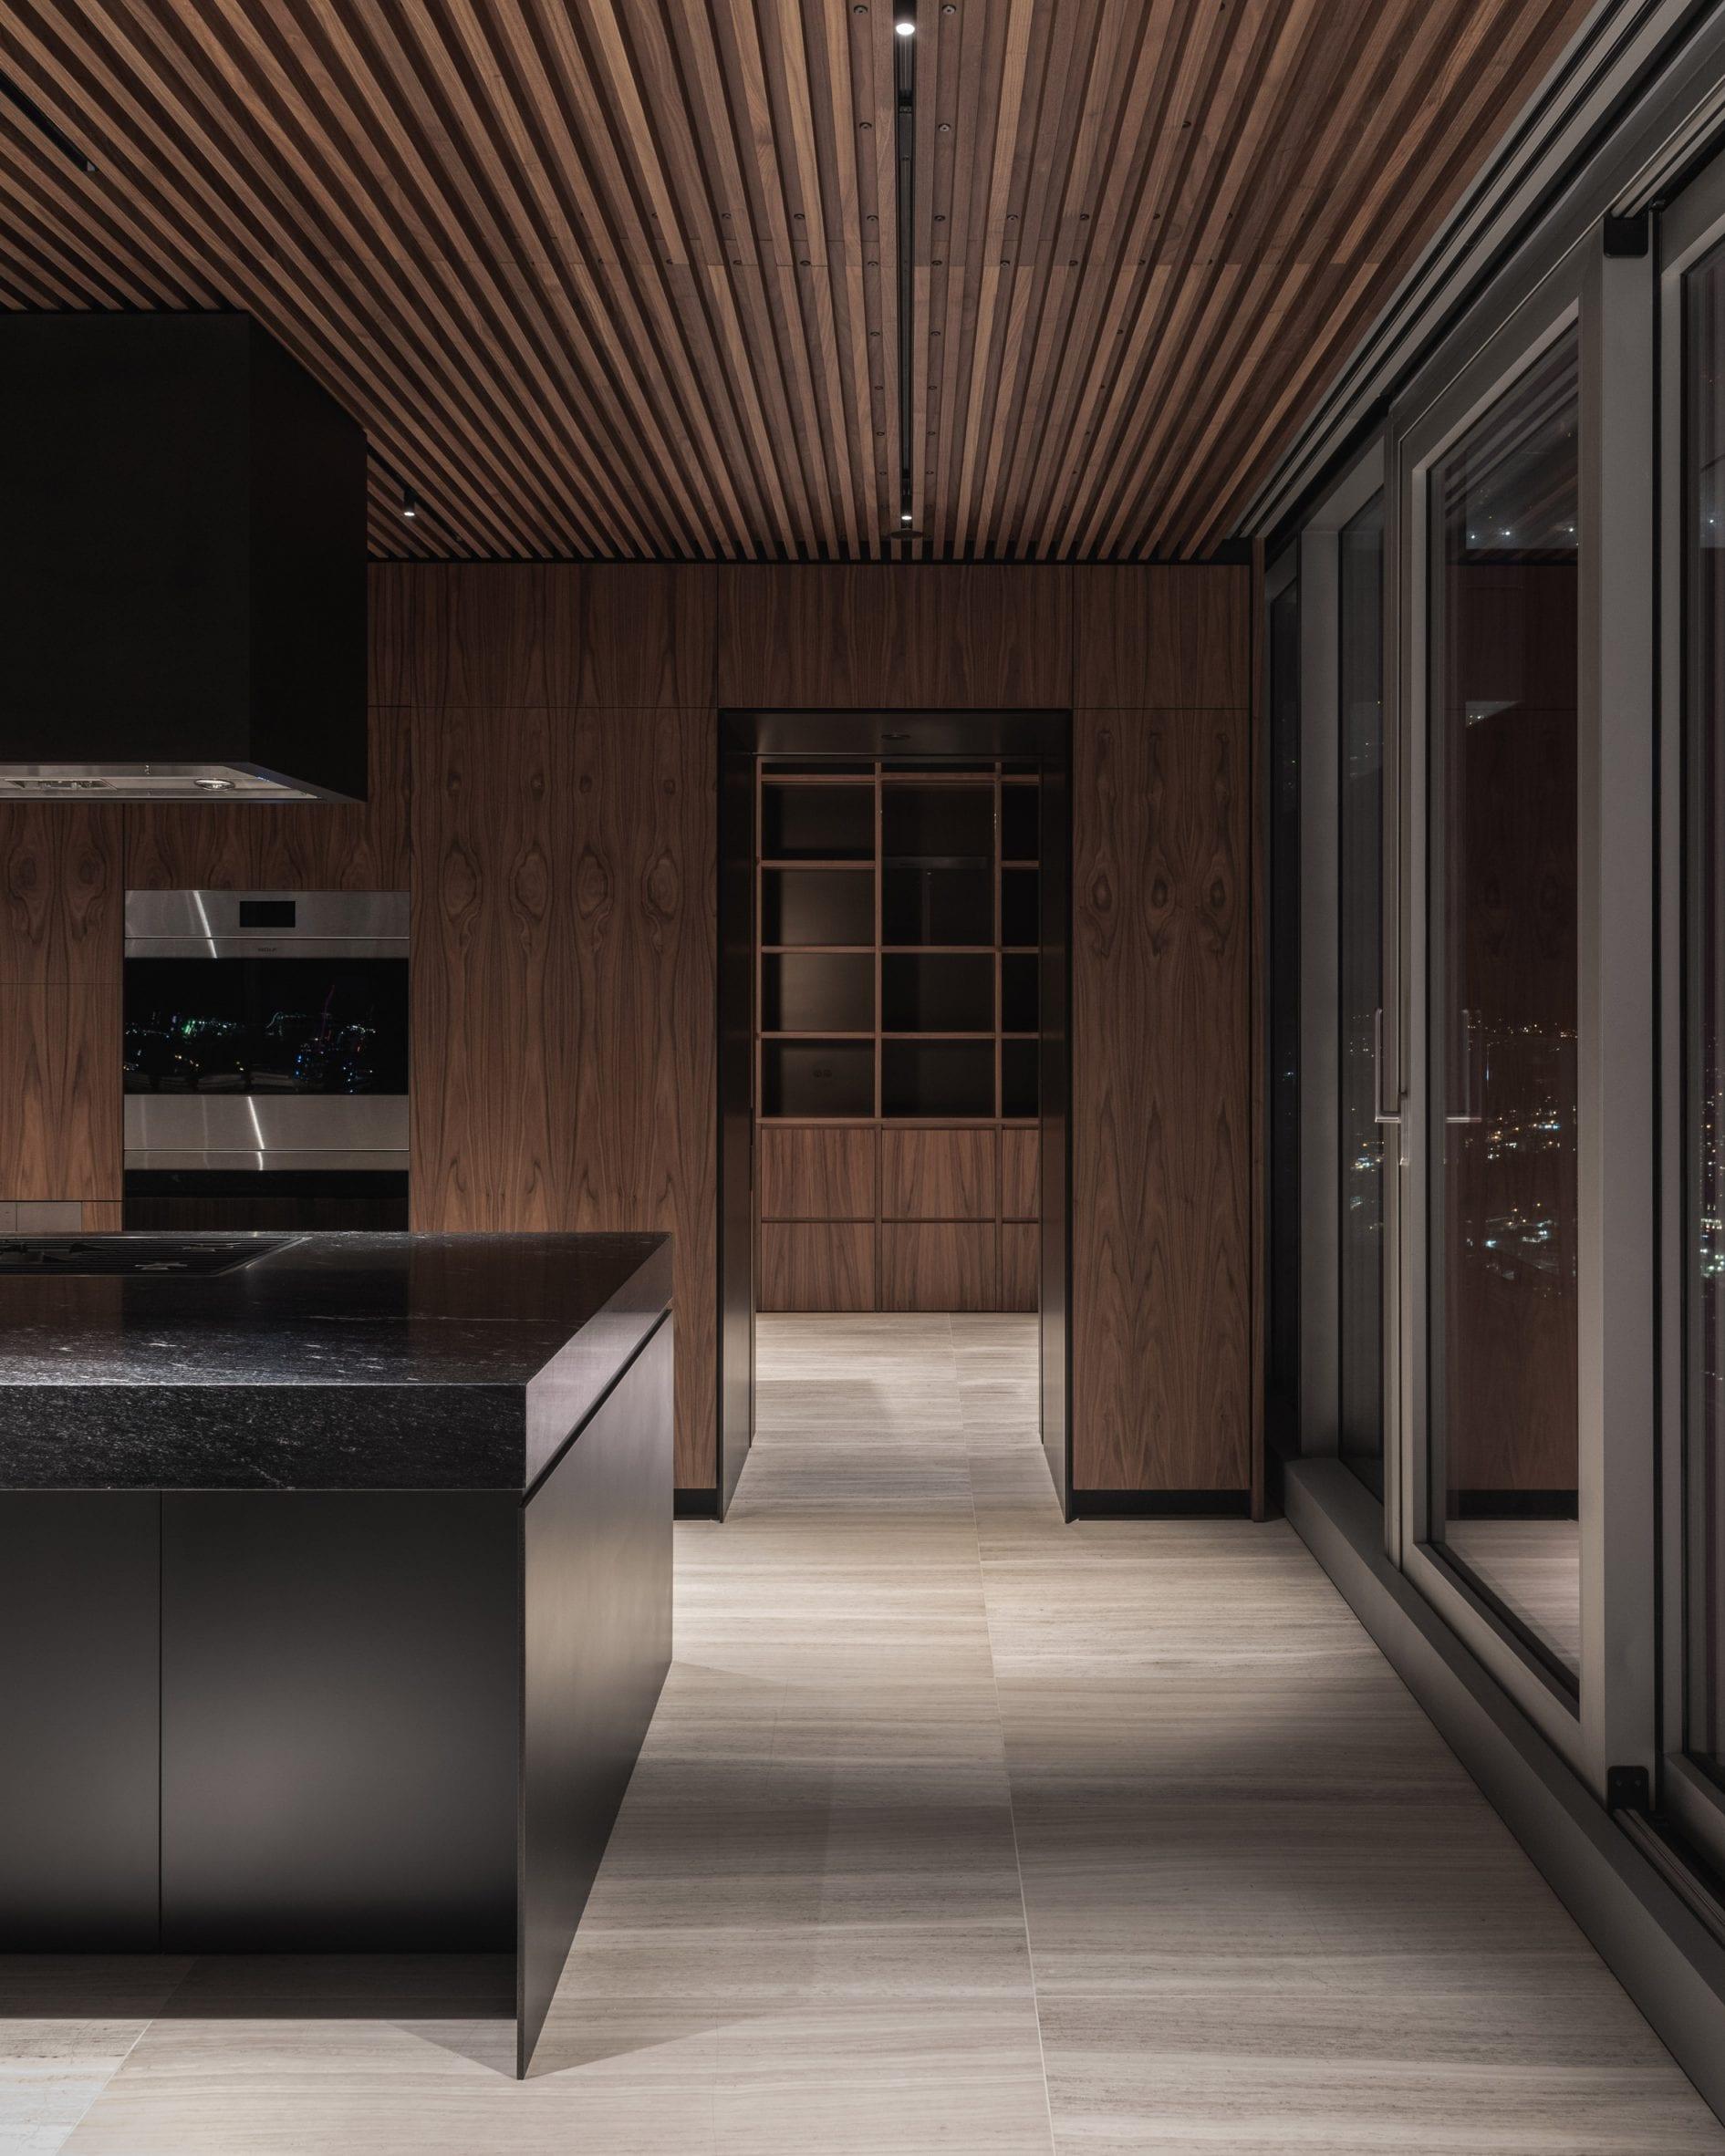 leckie-studio-penthouse-big-skyscraper-vancouver_dezeen_2364_col_24-scaled.jpg